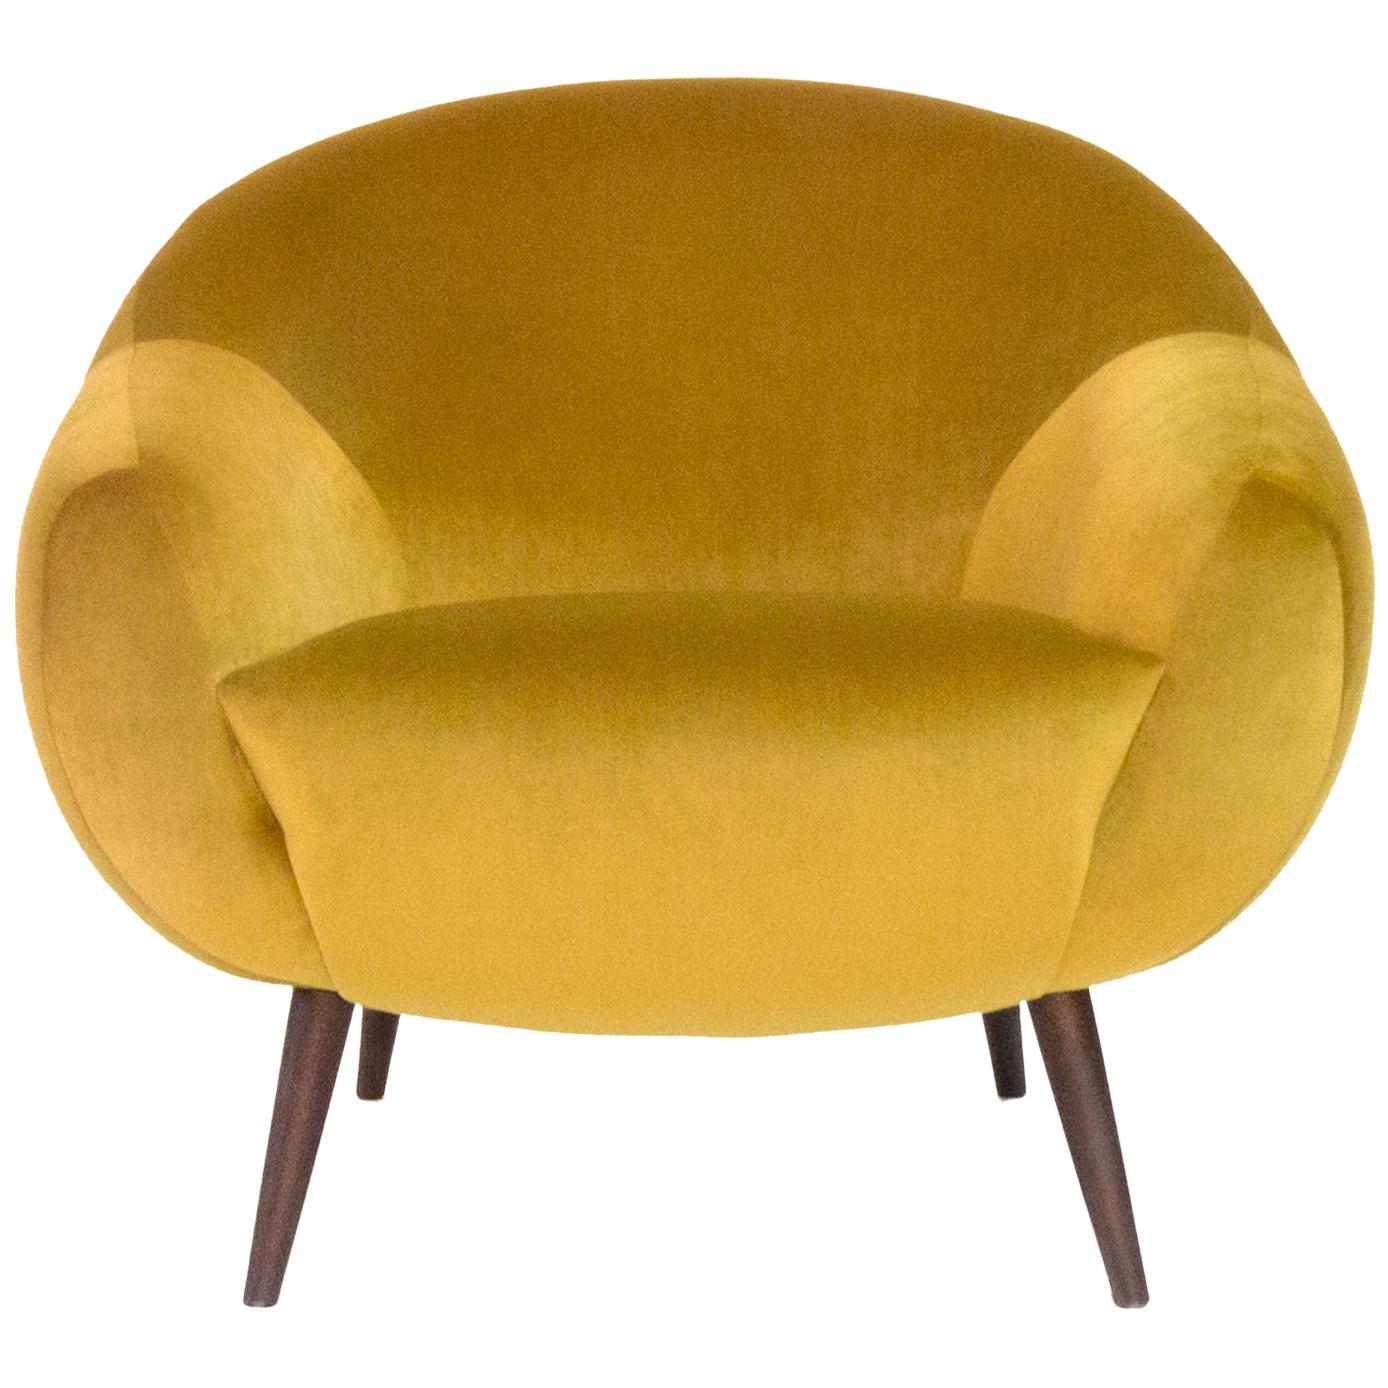 Oscar Niemeyer Midcentury 1950s Inspired Cotton Velvet Fabric Armchair